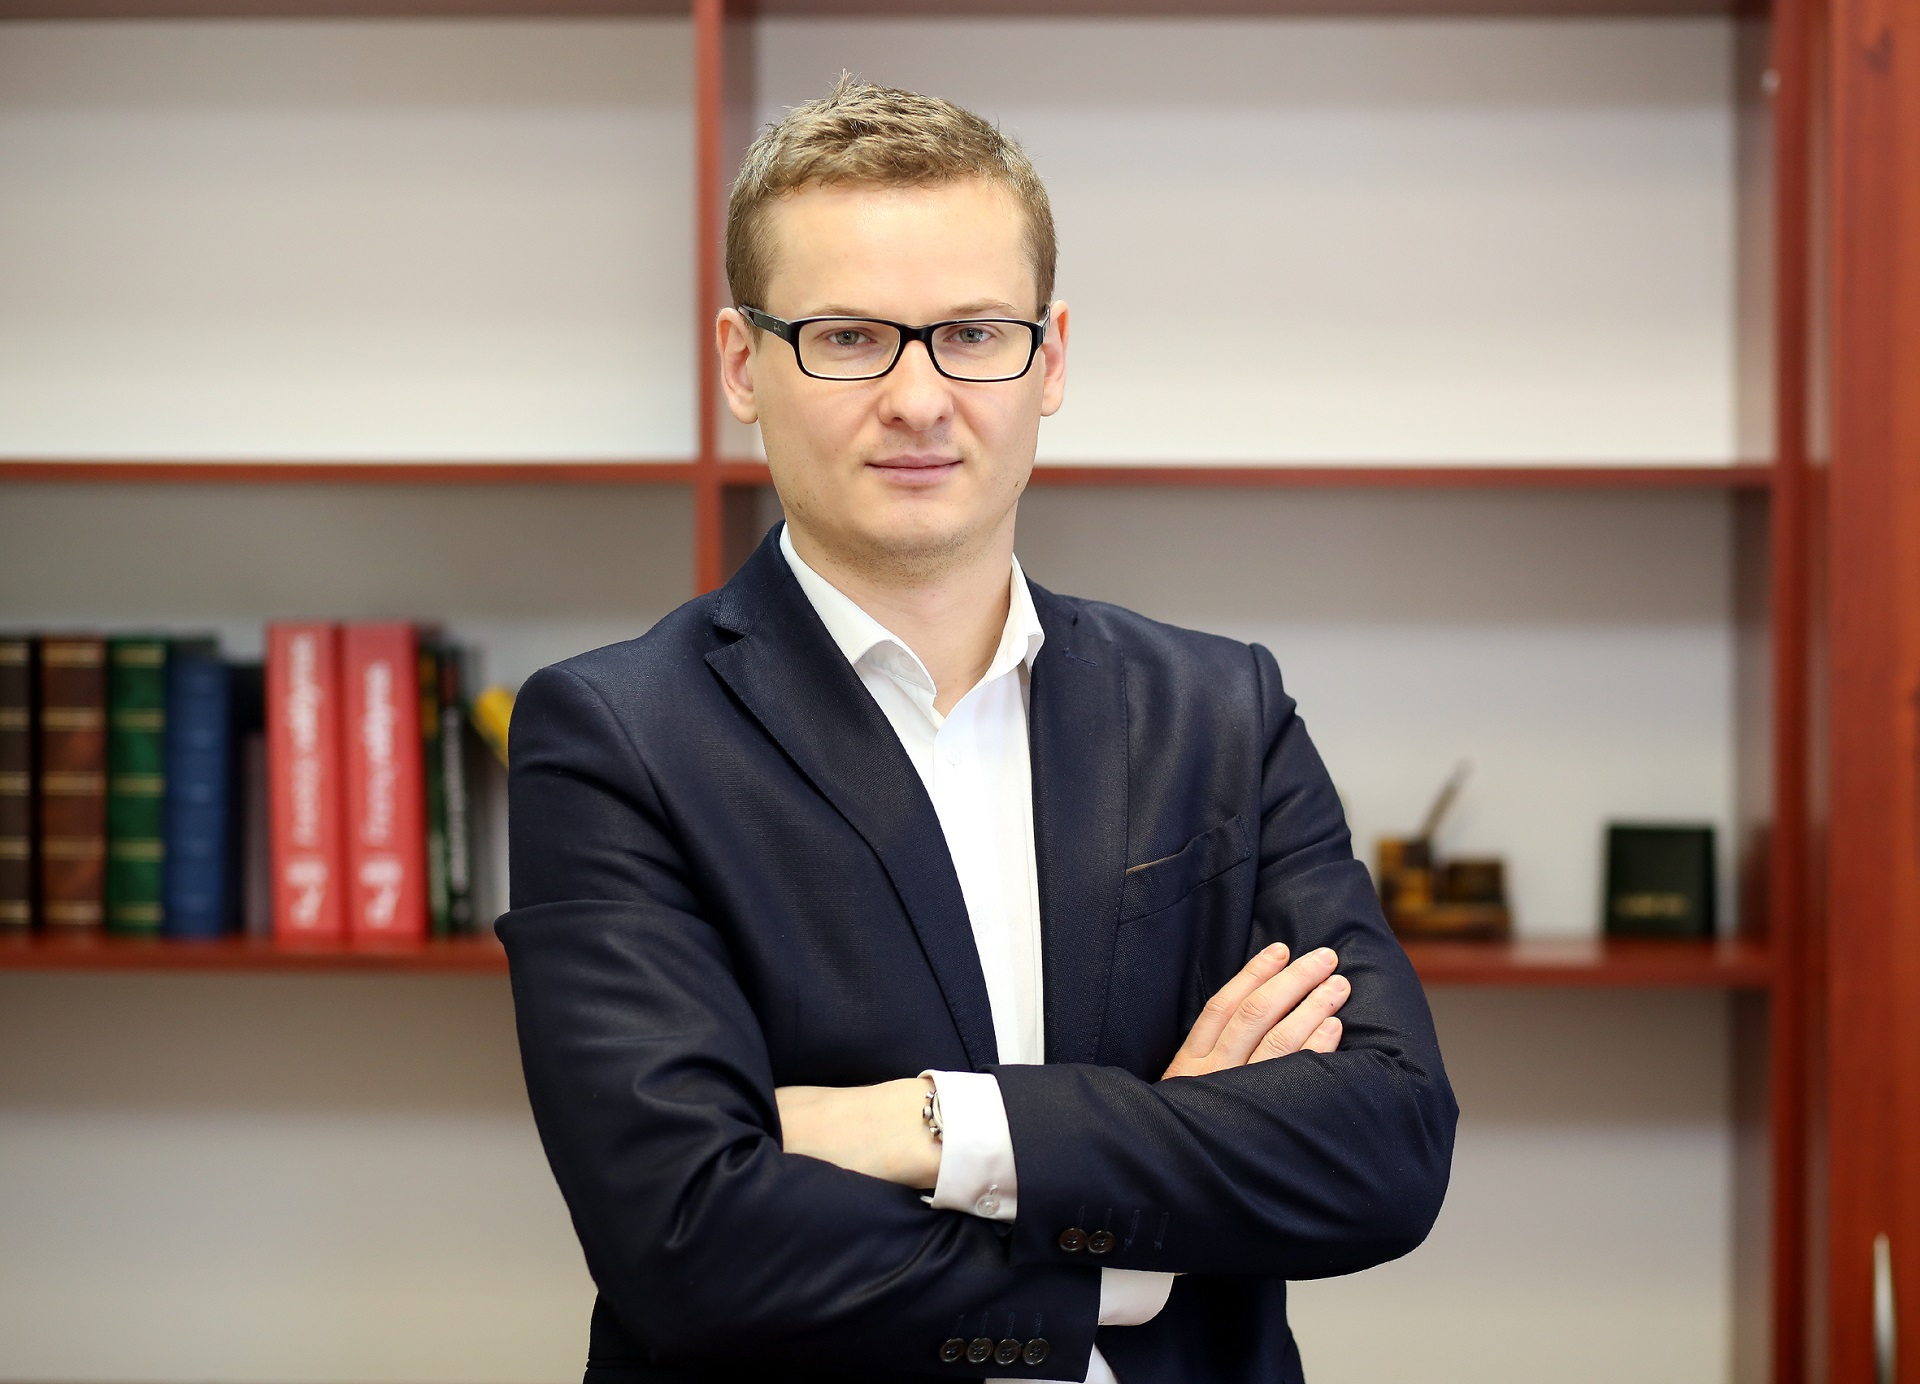 Algirdas Gauronskis, Vikeda gen. direktorius | headline.lt nuotr.